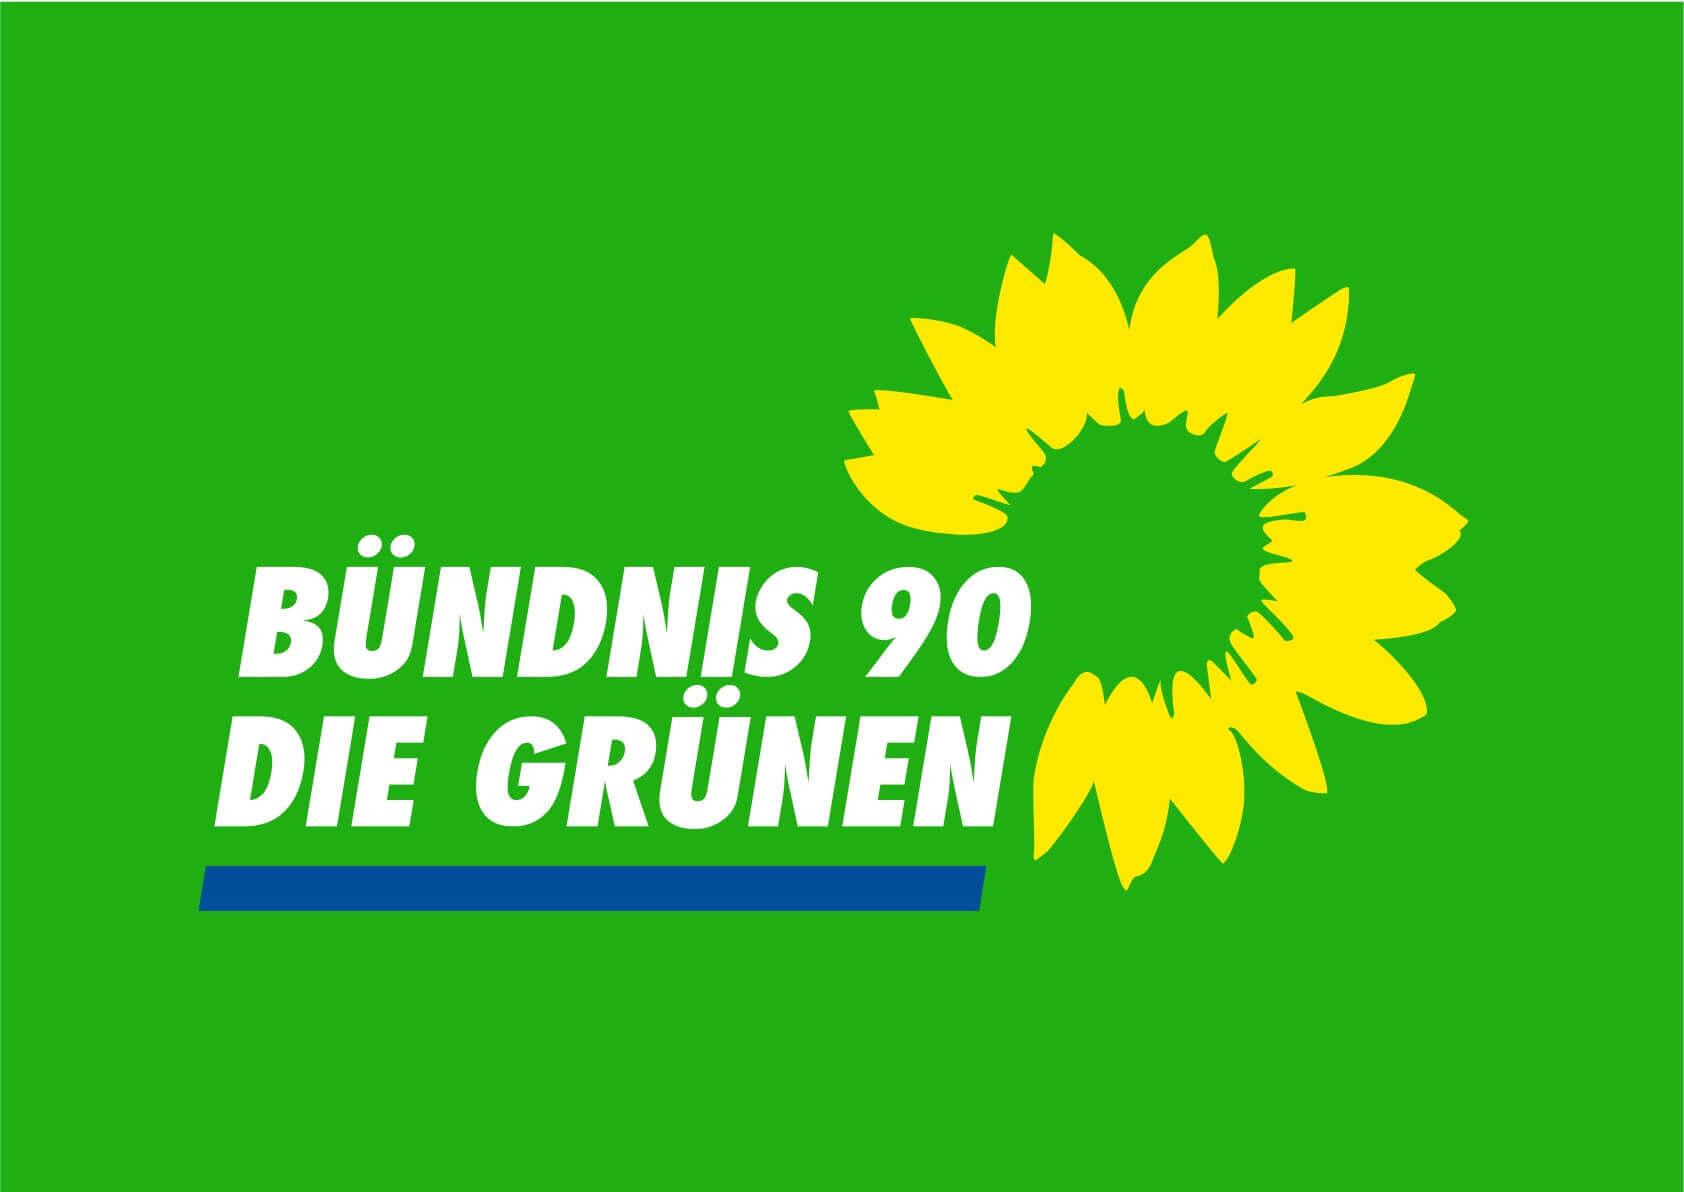 Despite GMO skepticism, German Green Party may endorse crop gene editing to promote farm sustainability